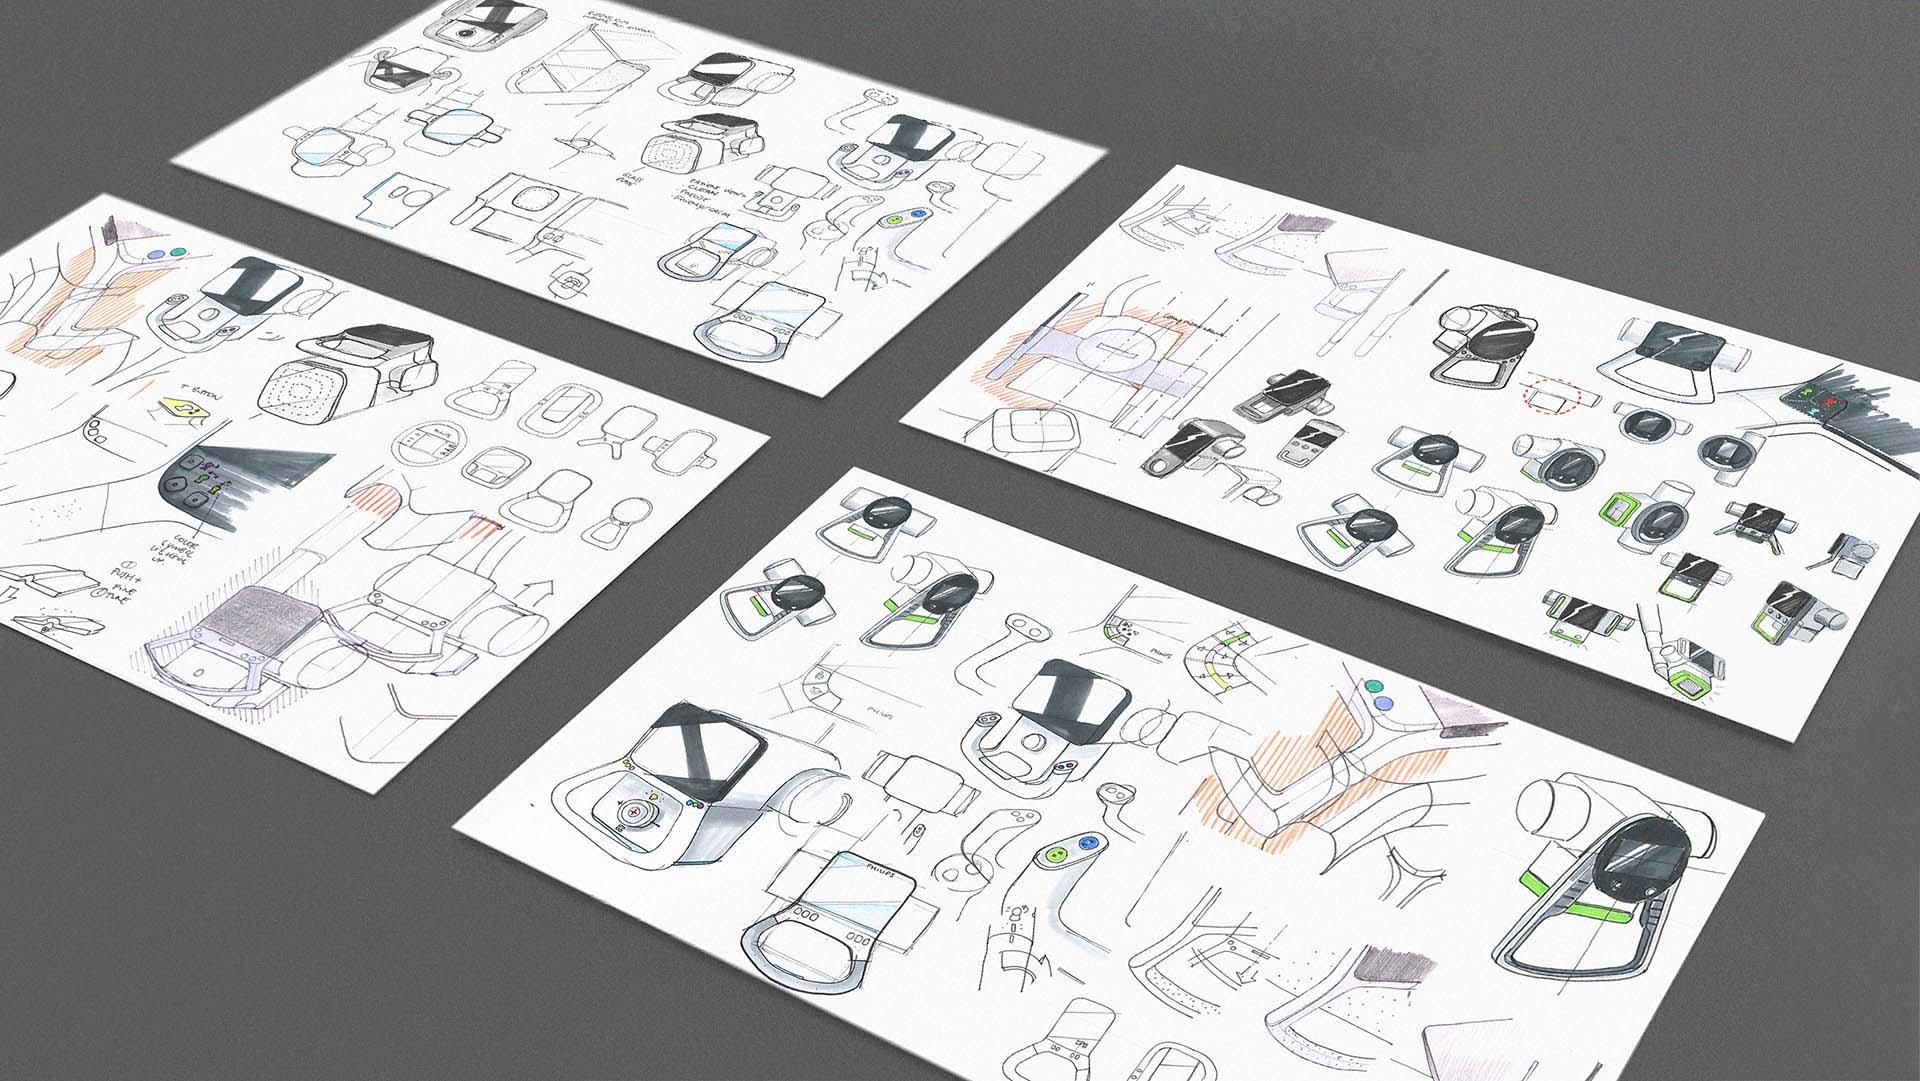 tubehead sketches